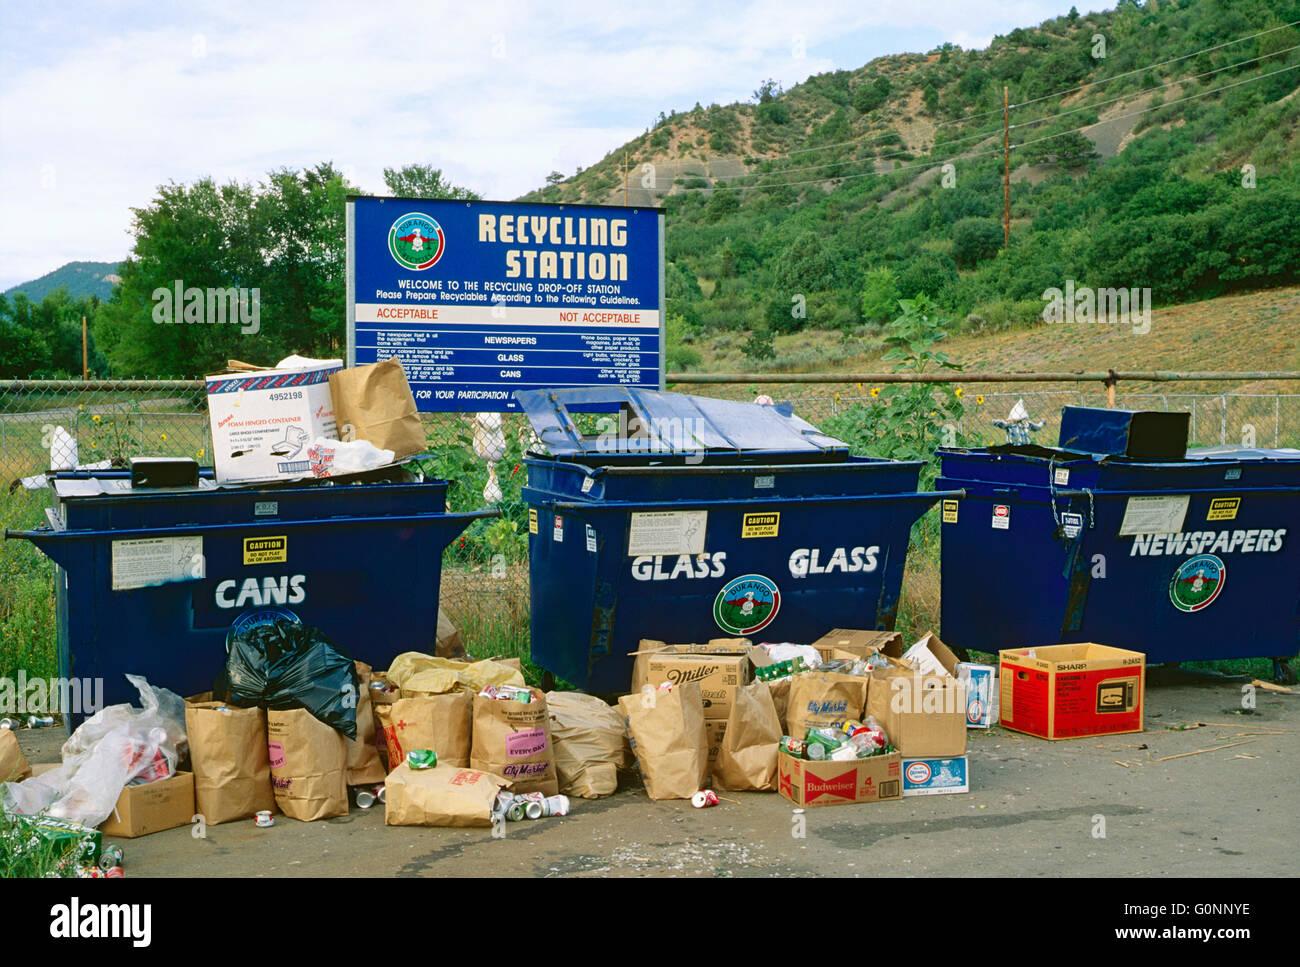 Verbraucher, die Recyclingstation; Durango; Colorado; USA Stockbild